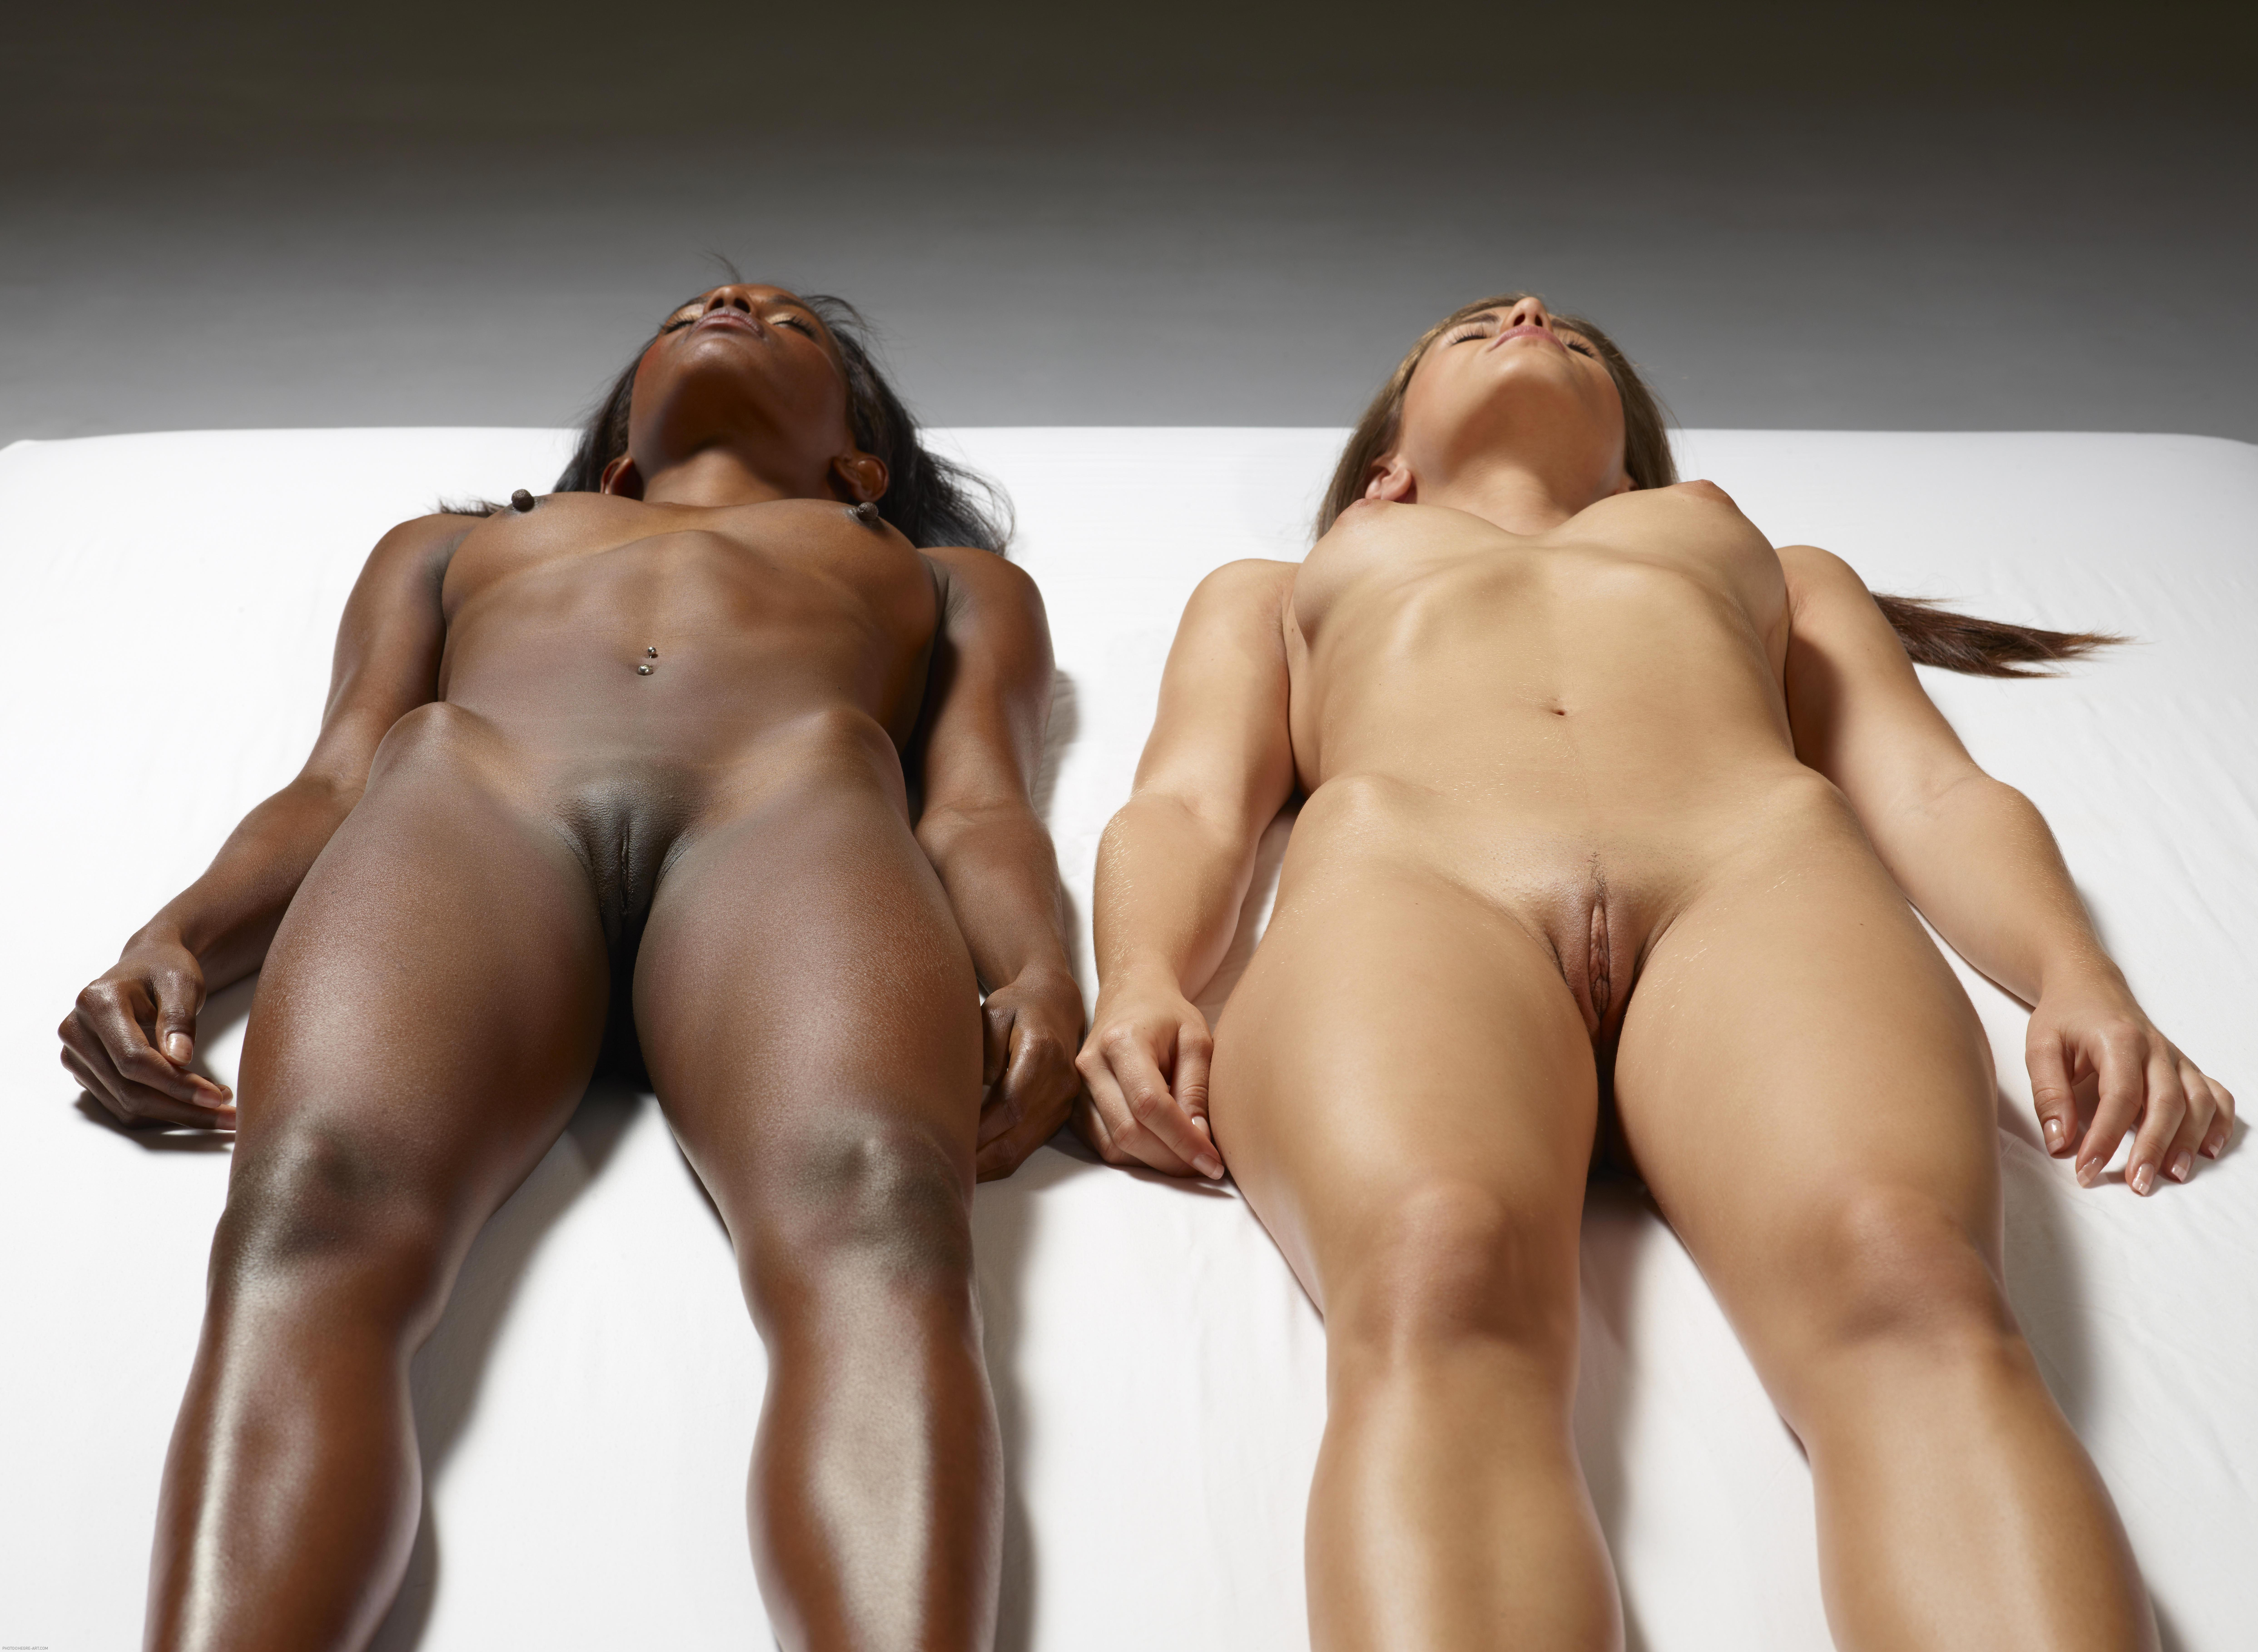 rachel weisz naked body